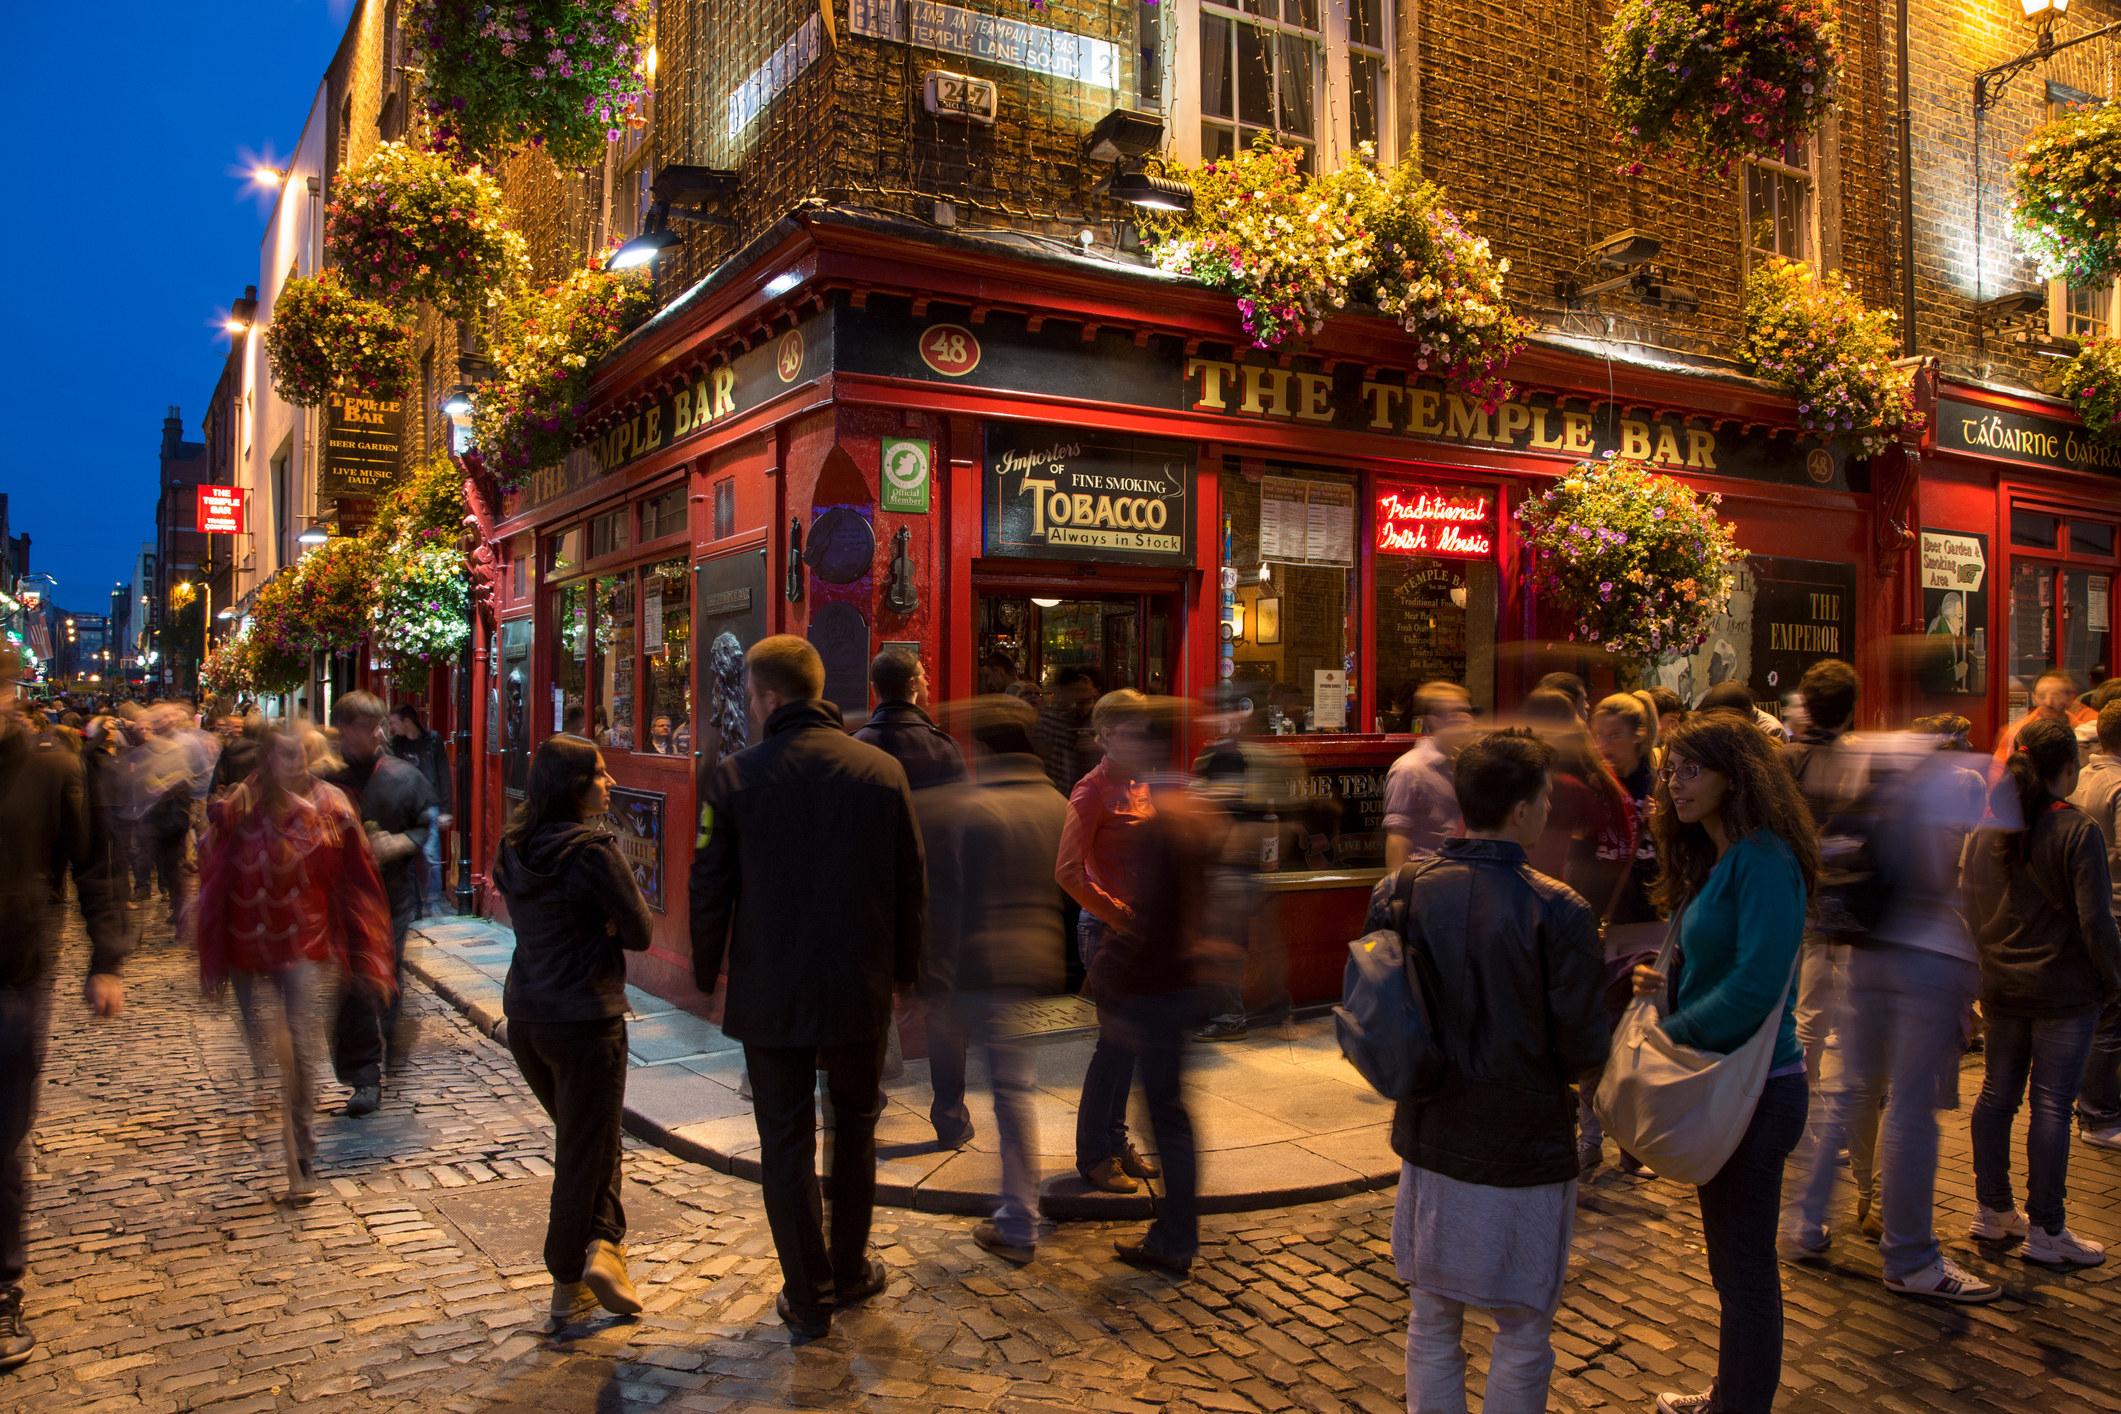 A crowd outside Temple Bar in Dublin.